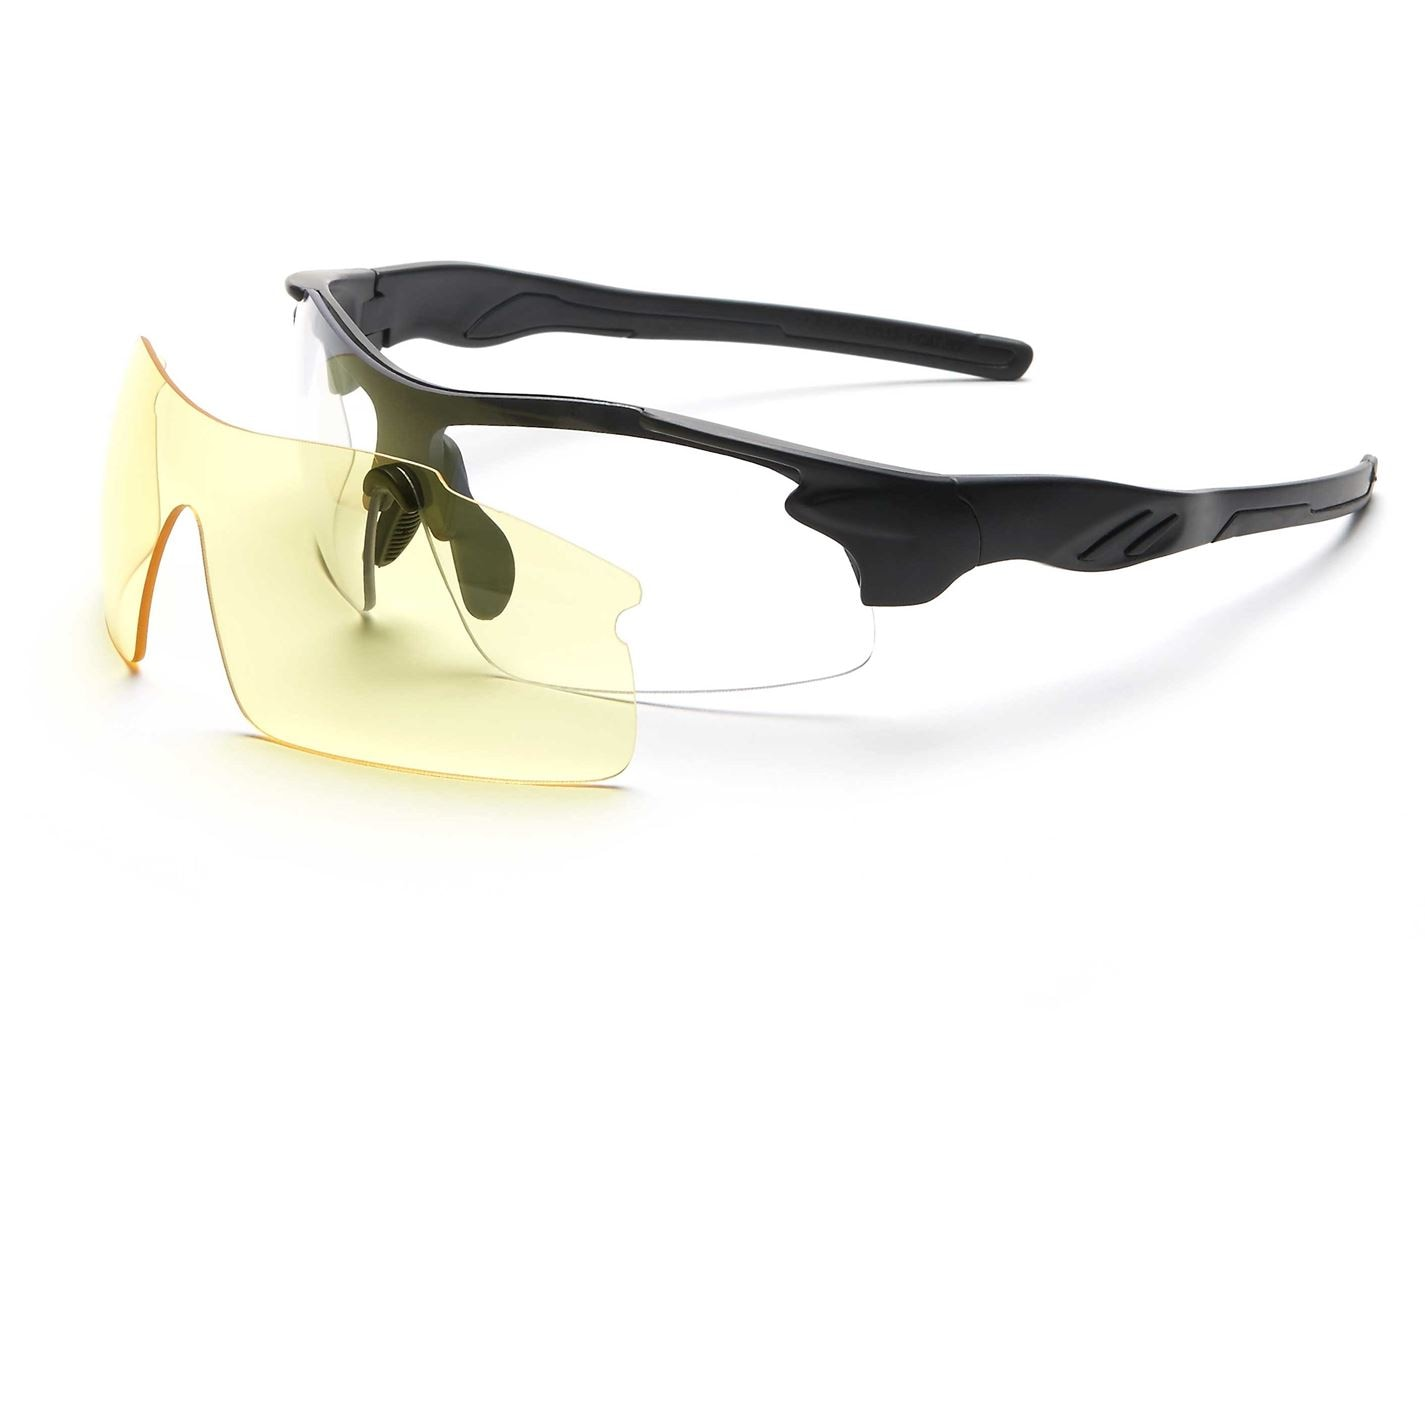 Mergi la FWE Photochromic Hydrophobic Multi Lens Glasses negru